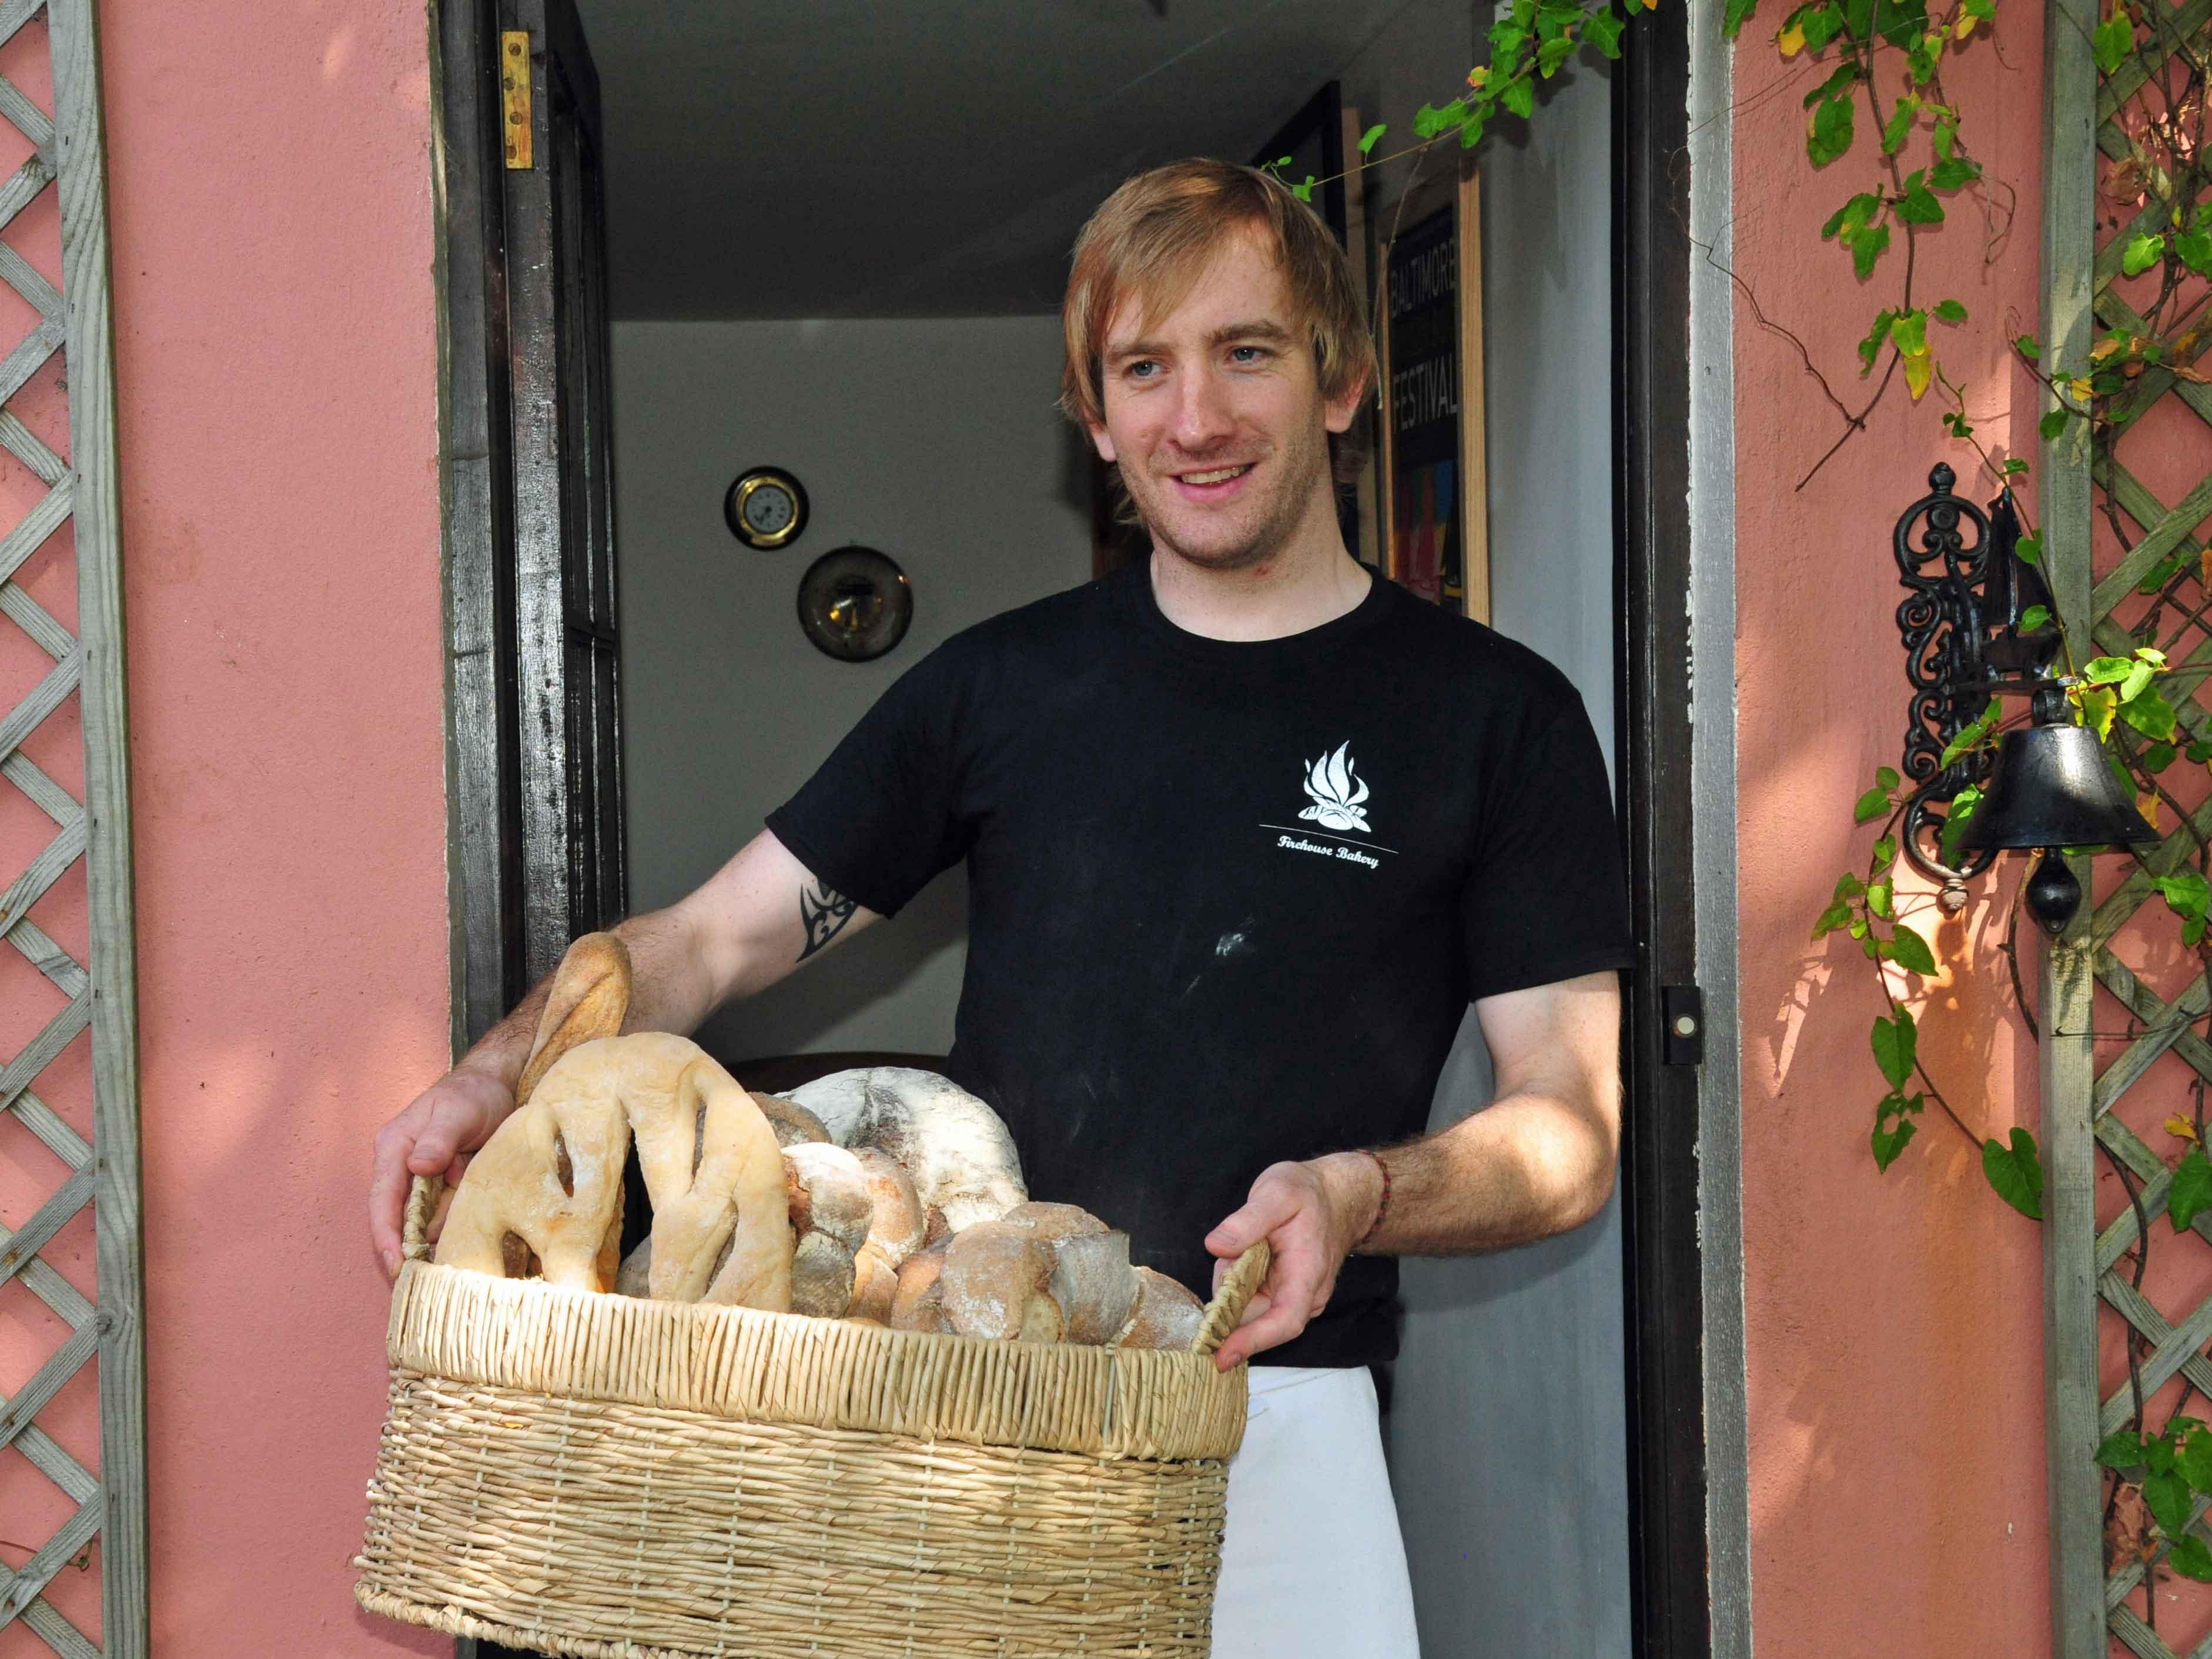 Patrick Ryan mit einem Korb Brote